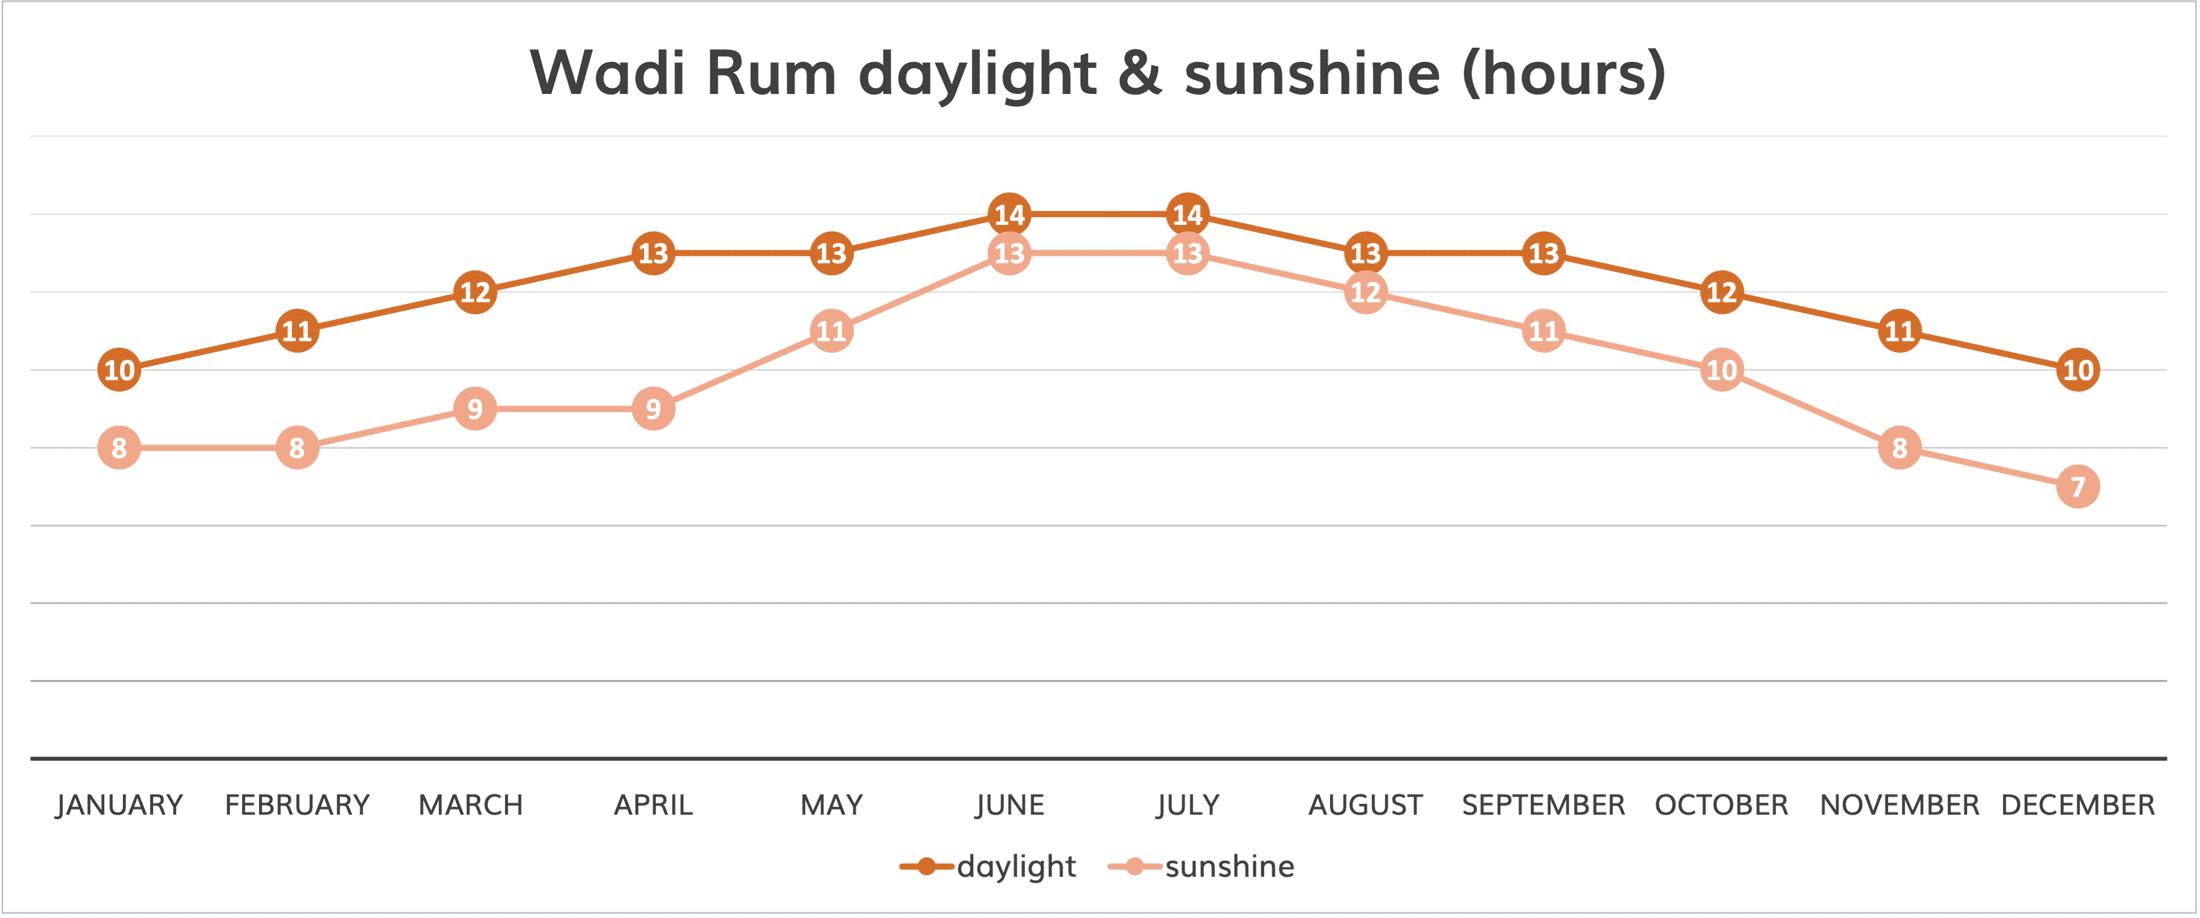 wadi rum weather daylight and sunshine chart